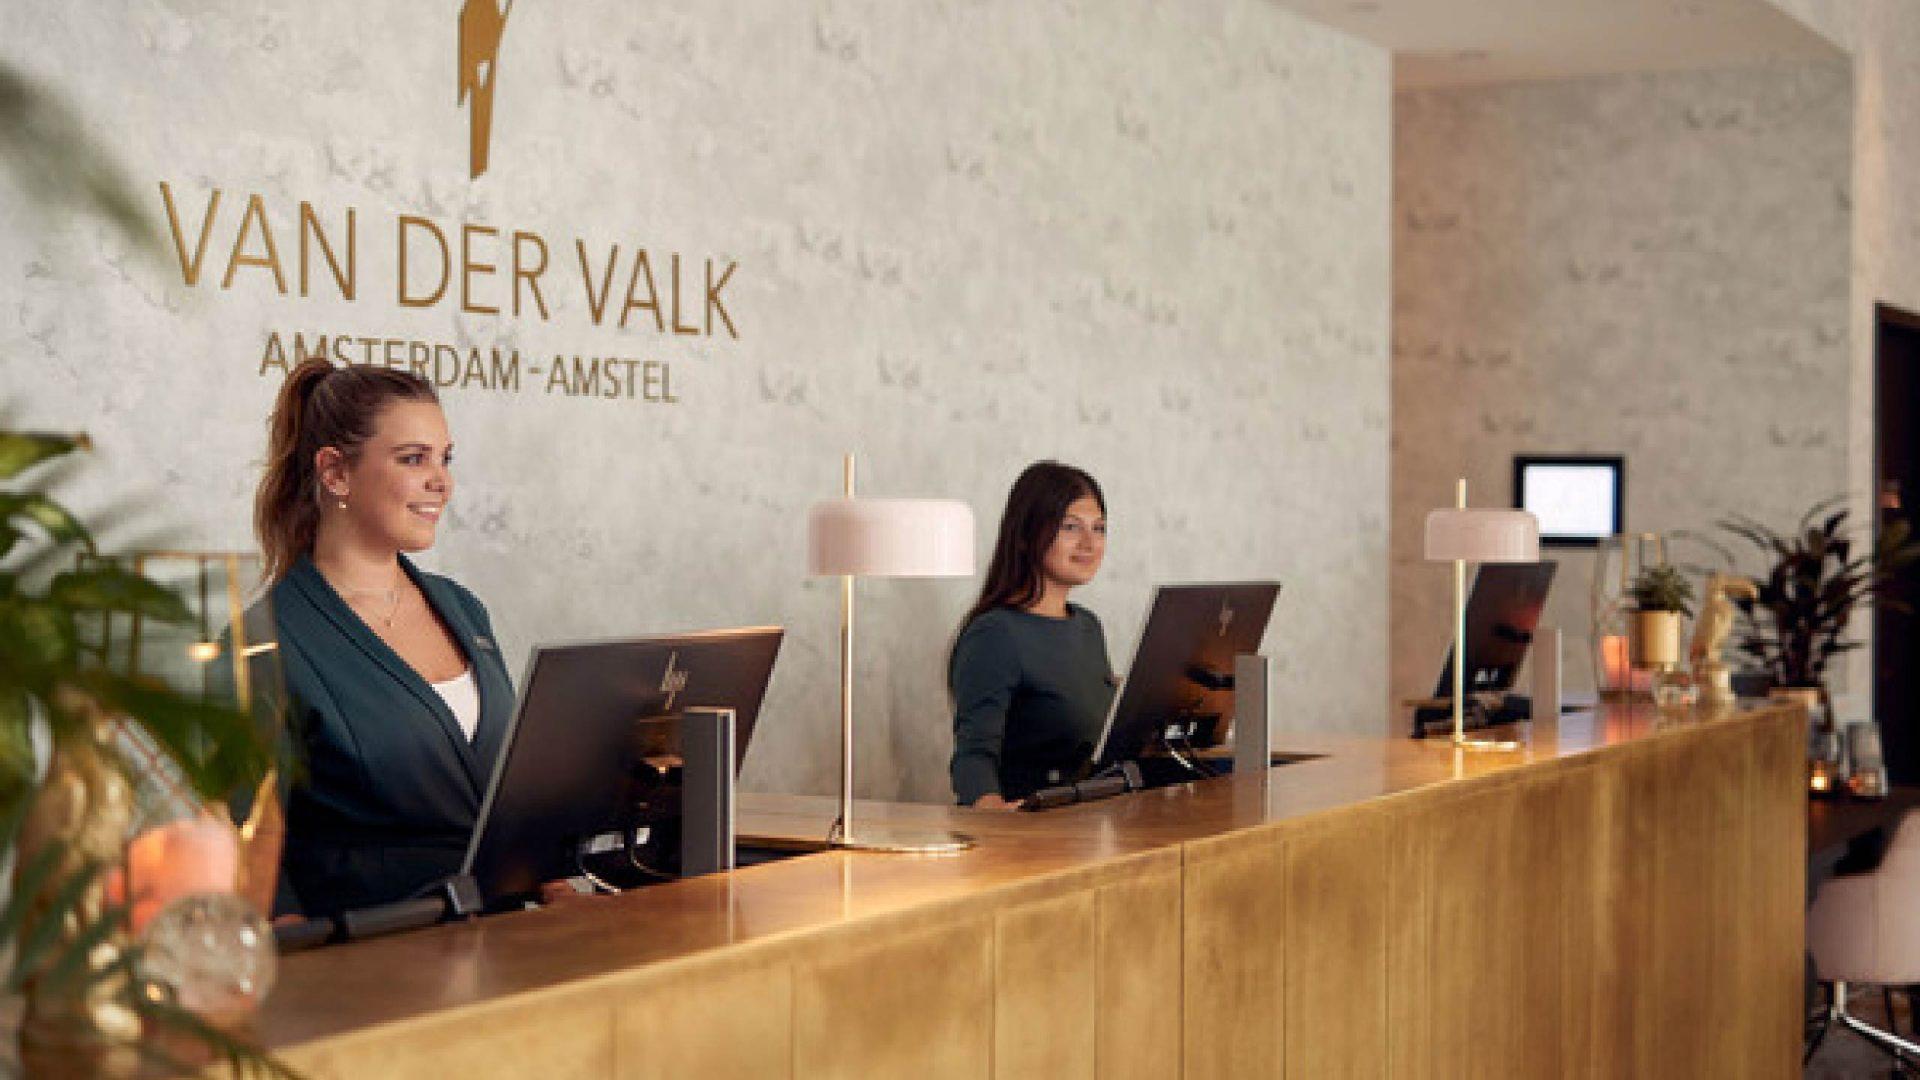 VanDerValk_AmsterdamAmstel_Slider-05